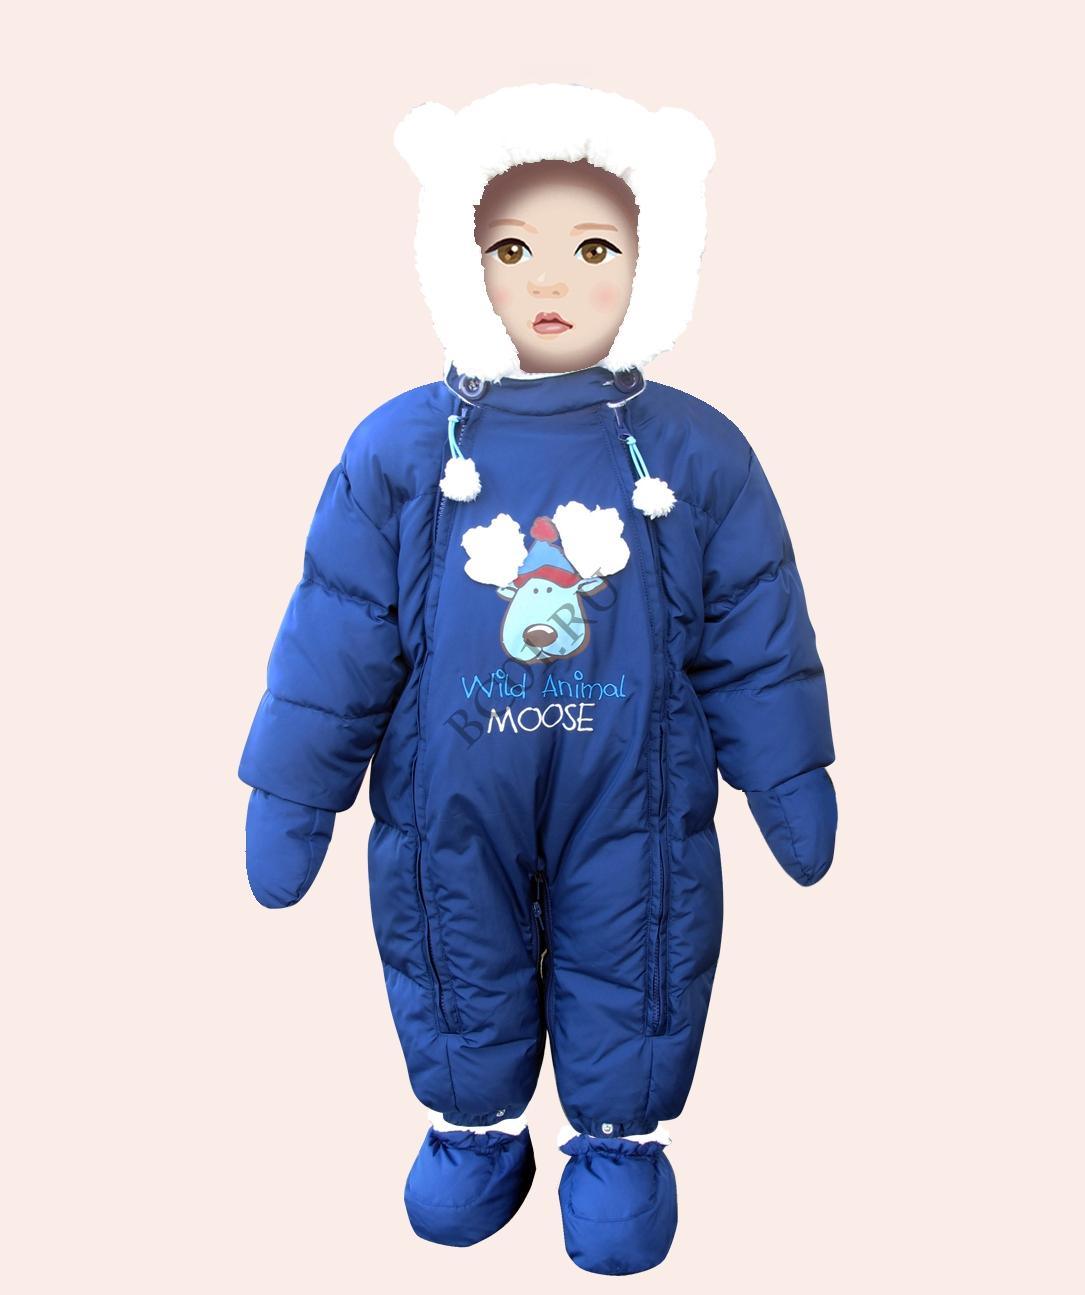 Сбор заказов. Baby club - 5: верхняя одежда и трикотаж. Распродажа. Без рядов, галереи! СТОП 23/11.